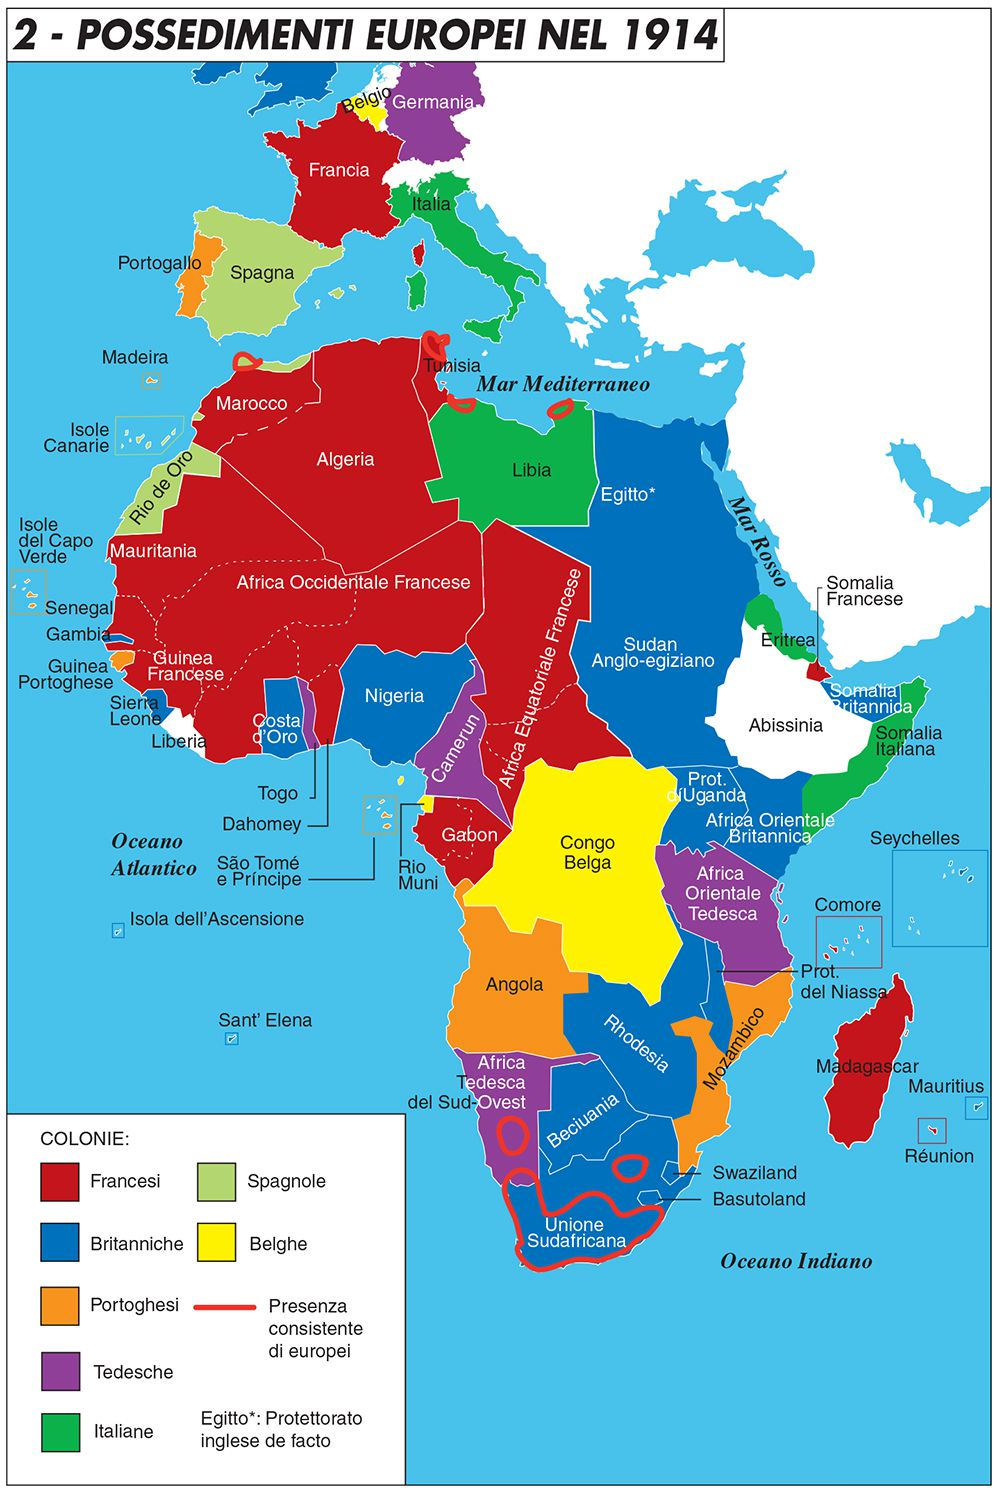 Cartina Geografica Europa E Africa.Gli Europei In Africa Nel 1914 Limes